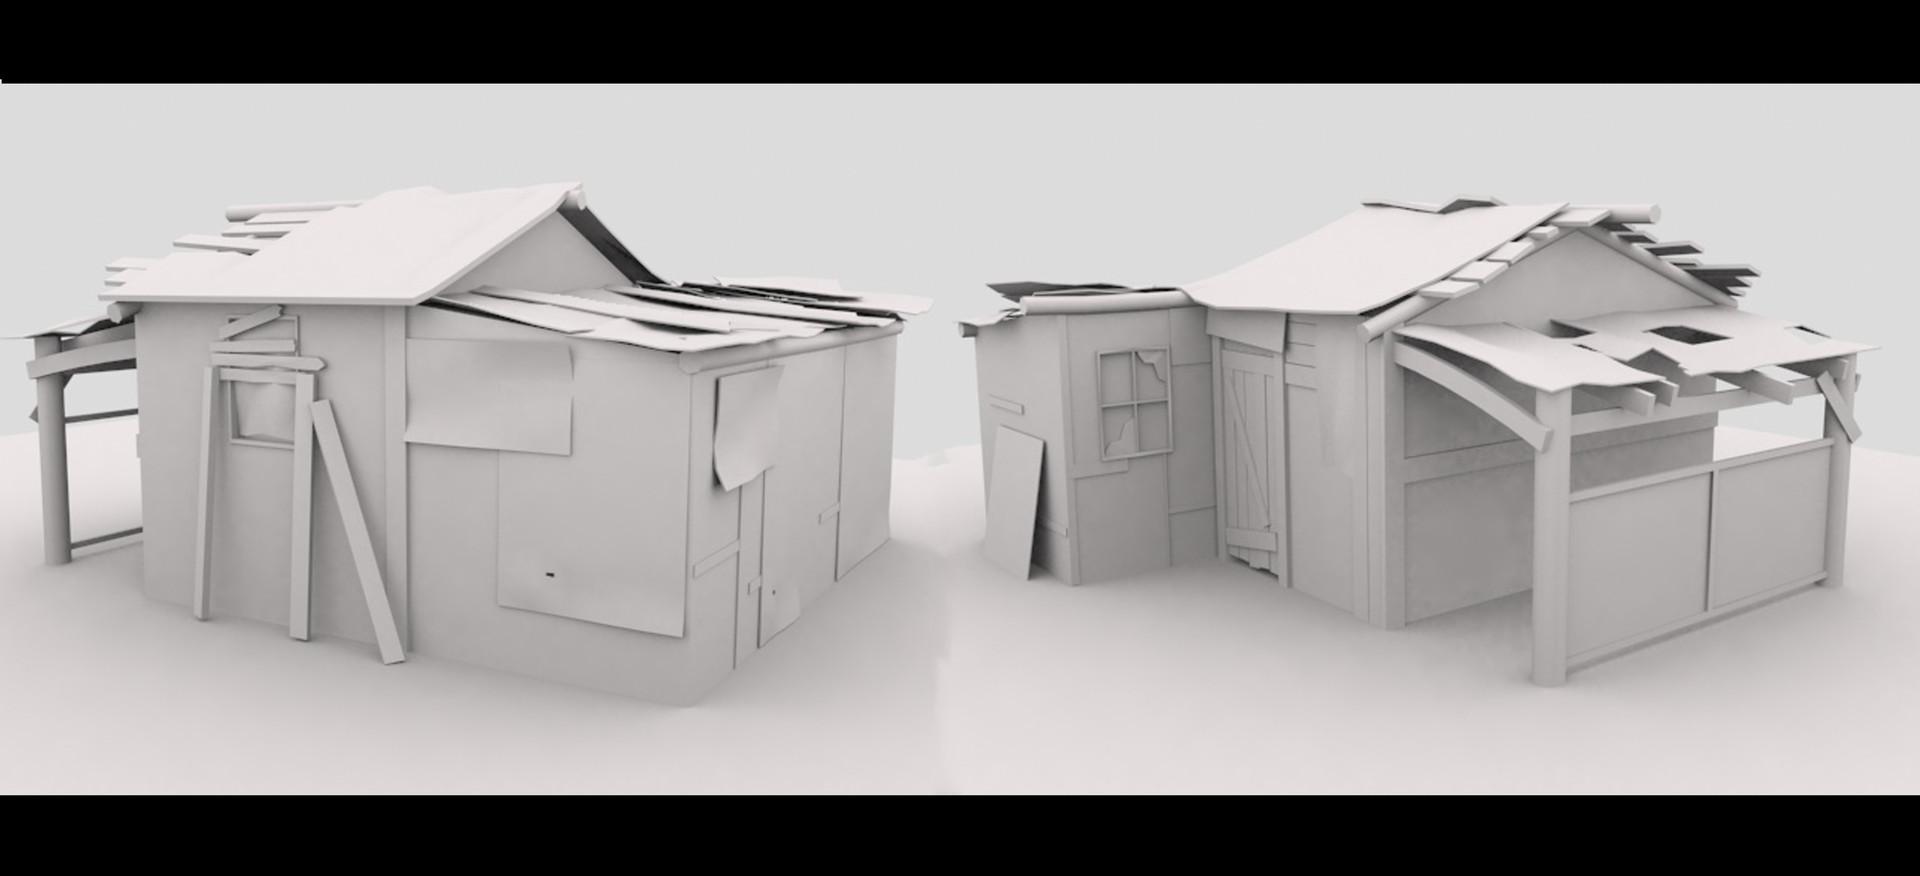 Michael tu shack clay render artstation